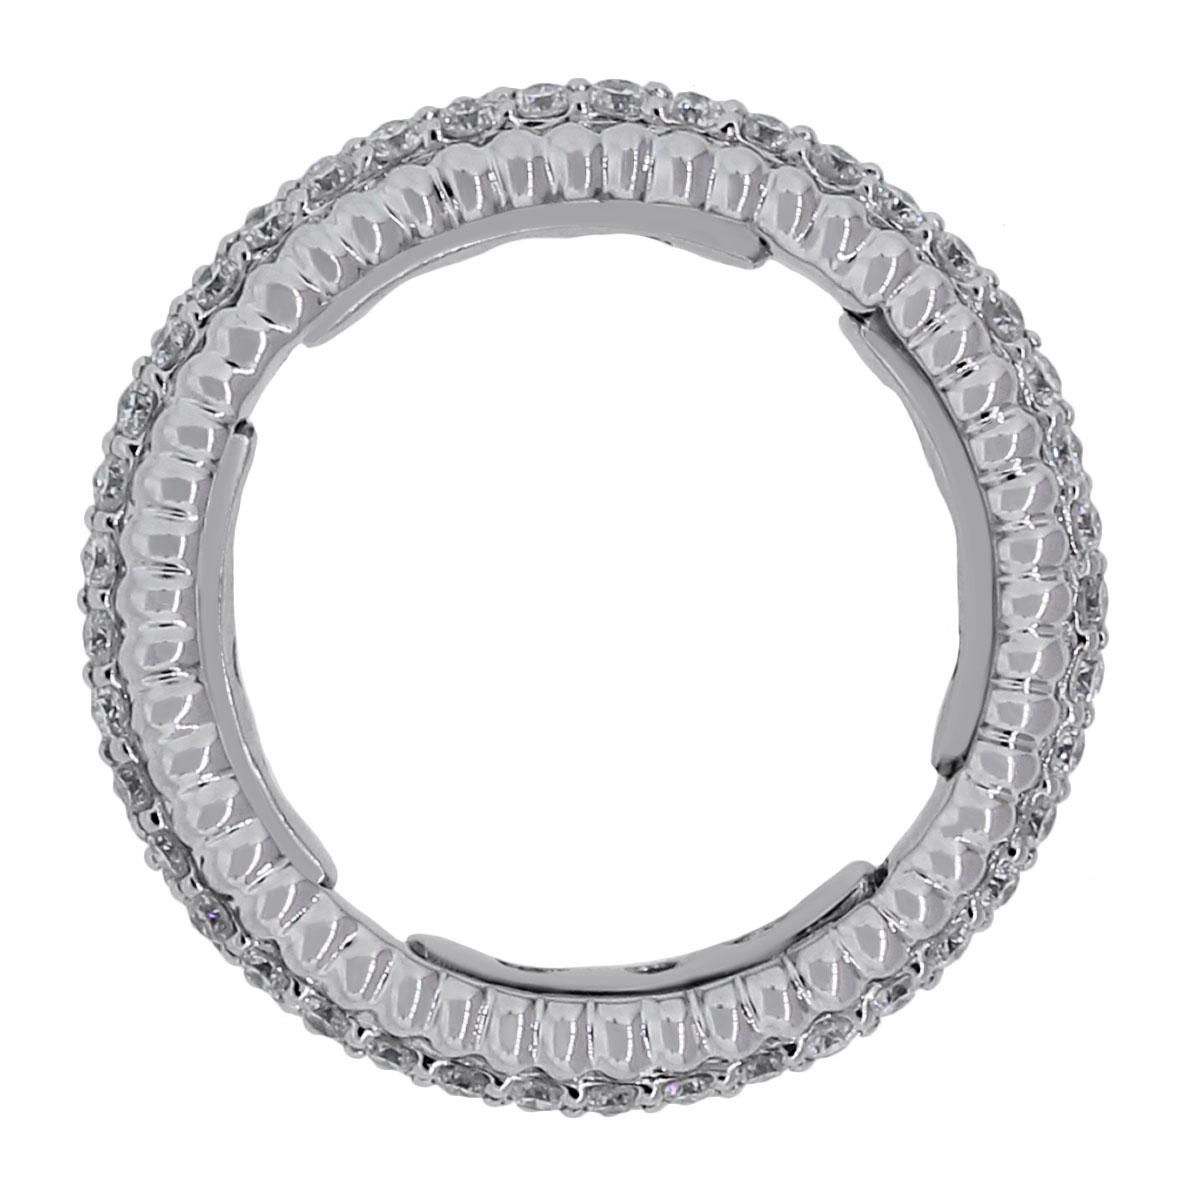 14k white gold 1 25ctw pave diamond flexible wedding band white wedding band 14k white gold diamond wedding band